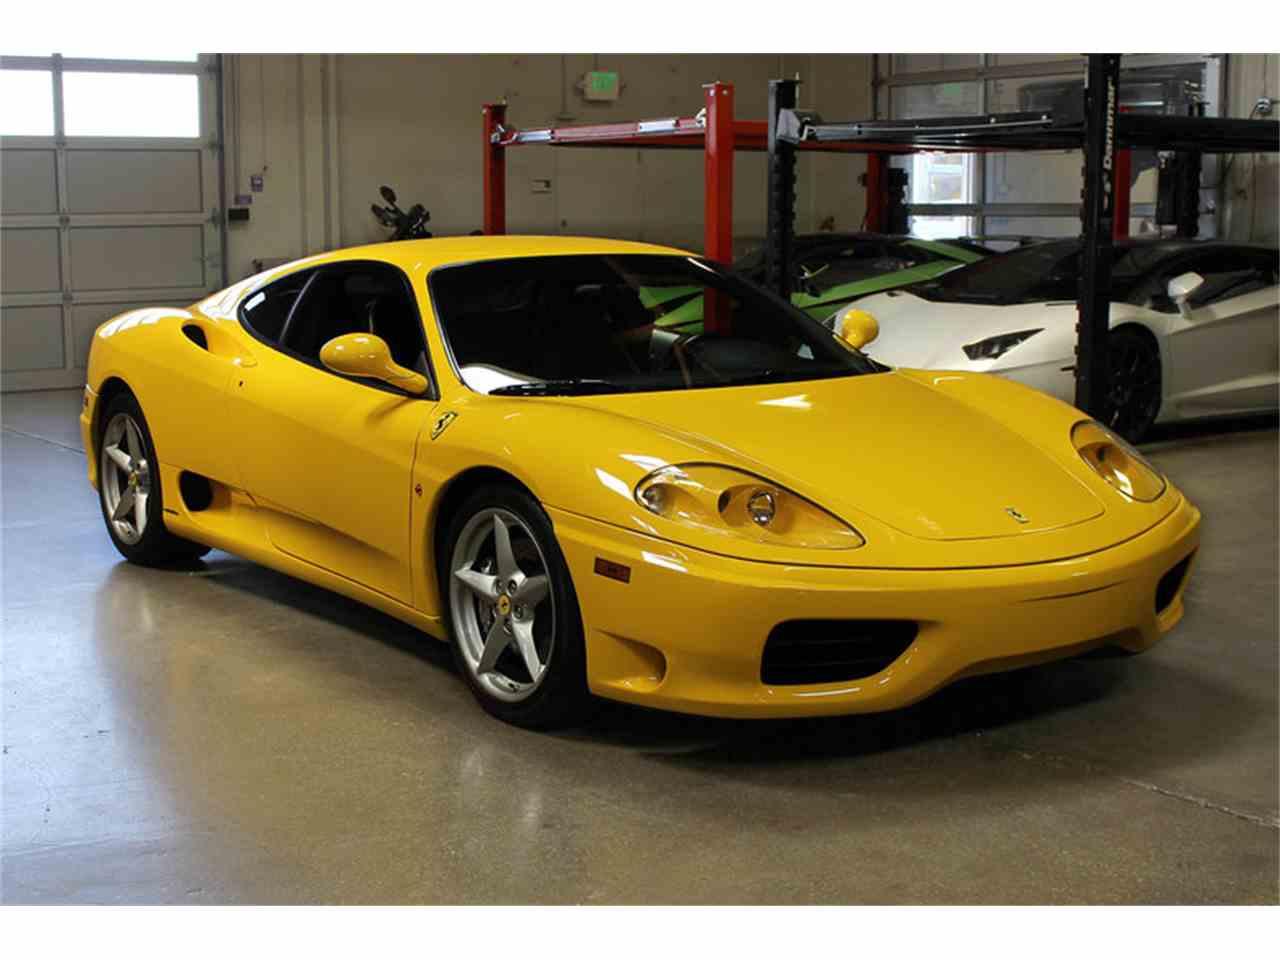 2001 Ferrari 360 for Sale - CC-1016547